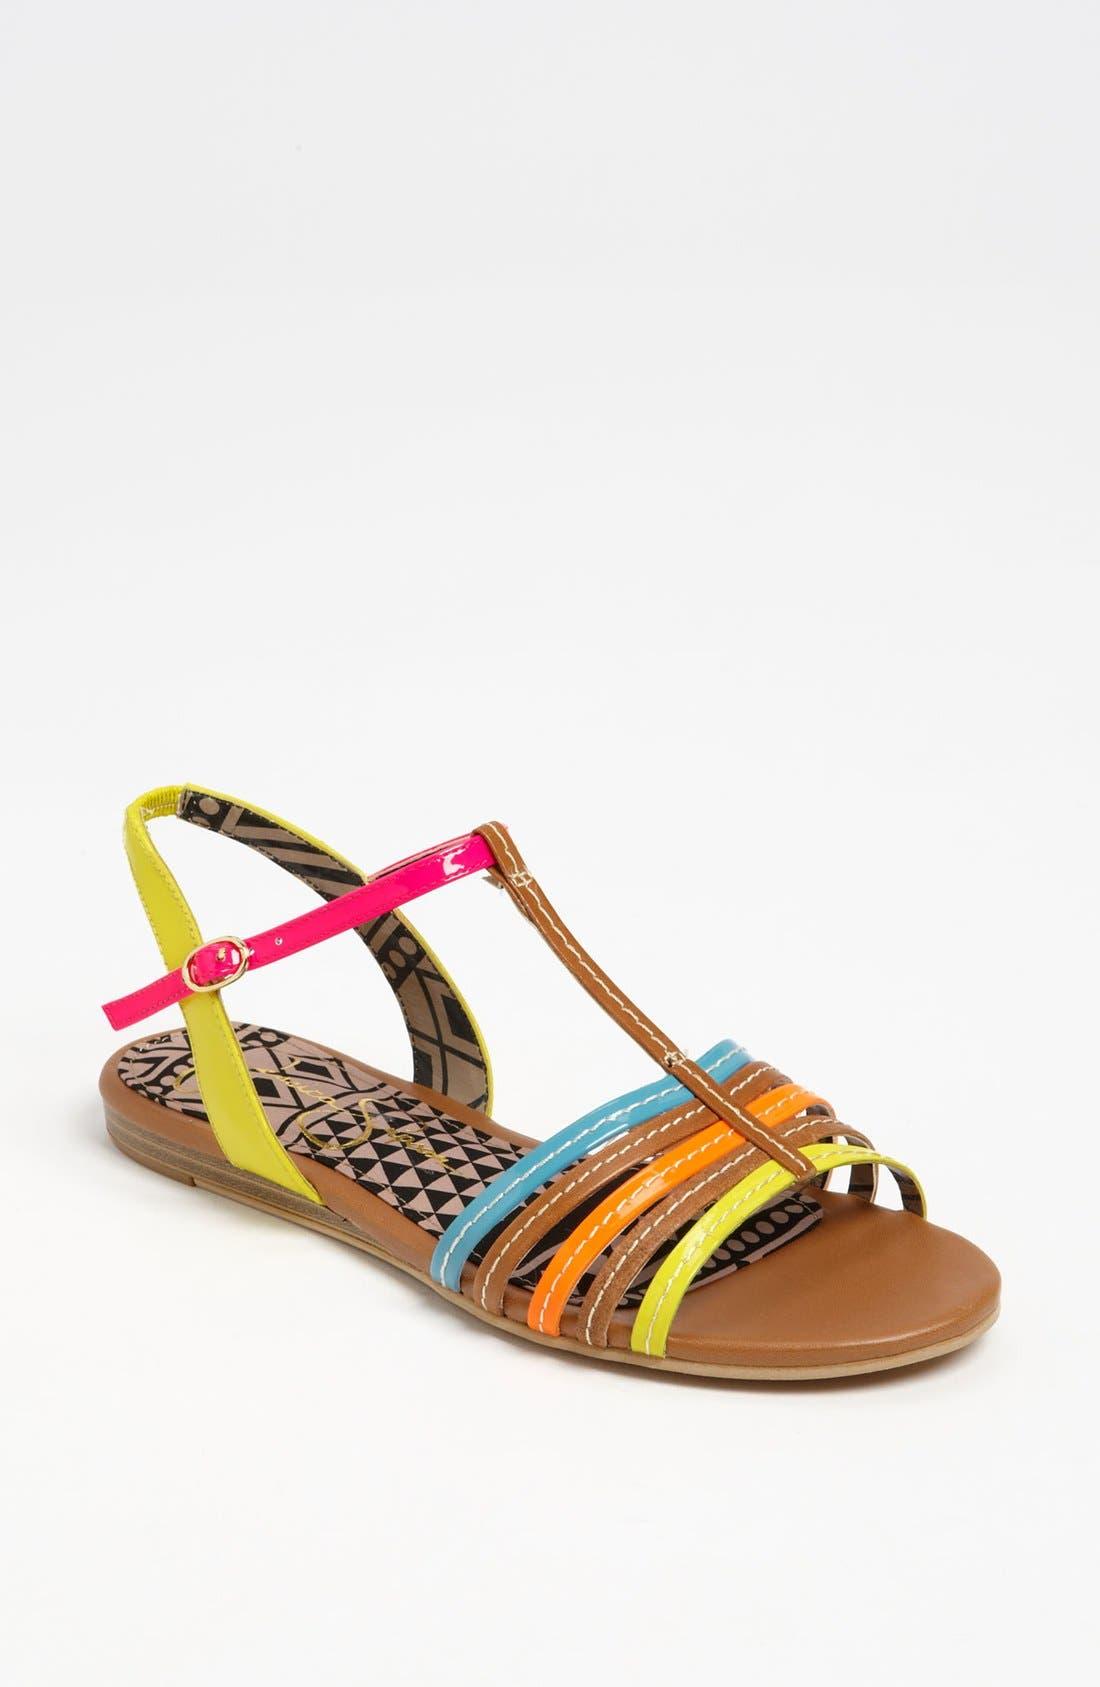 Alternate Image 1 Selected - Jessica Simpson 'Deniece' Sandal